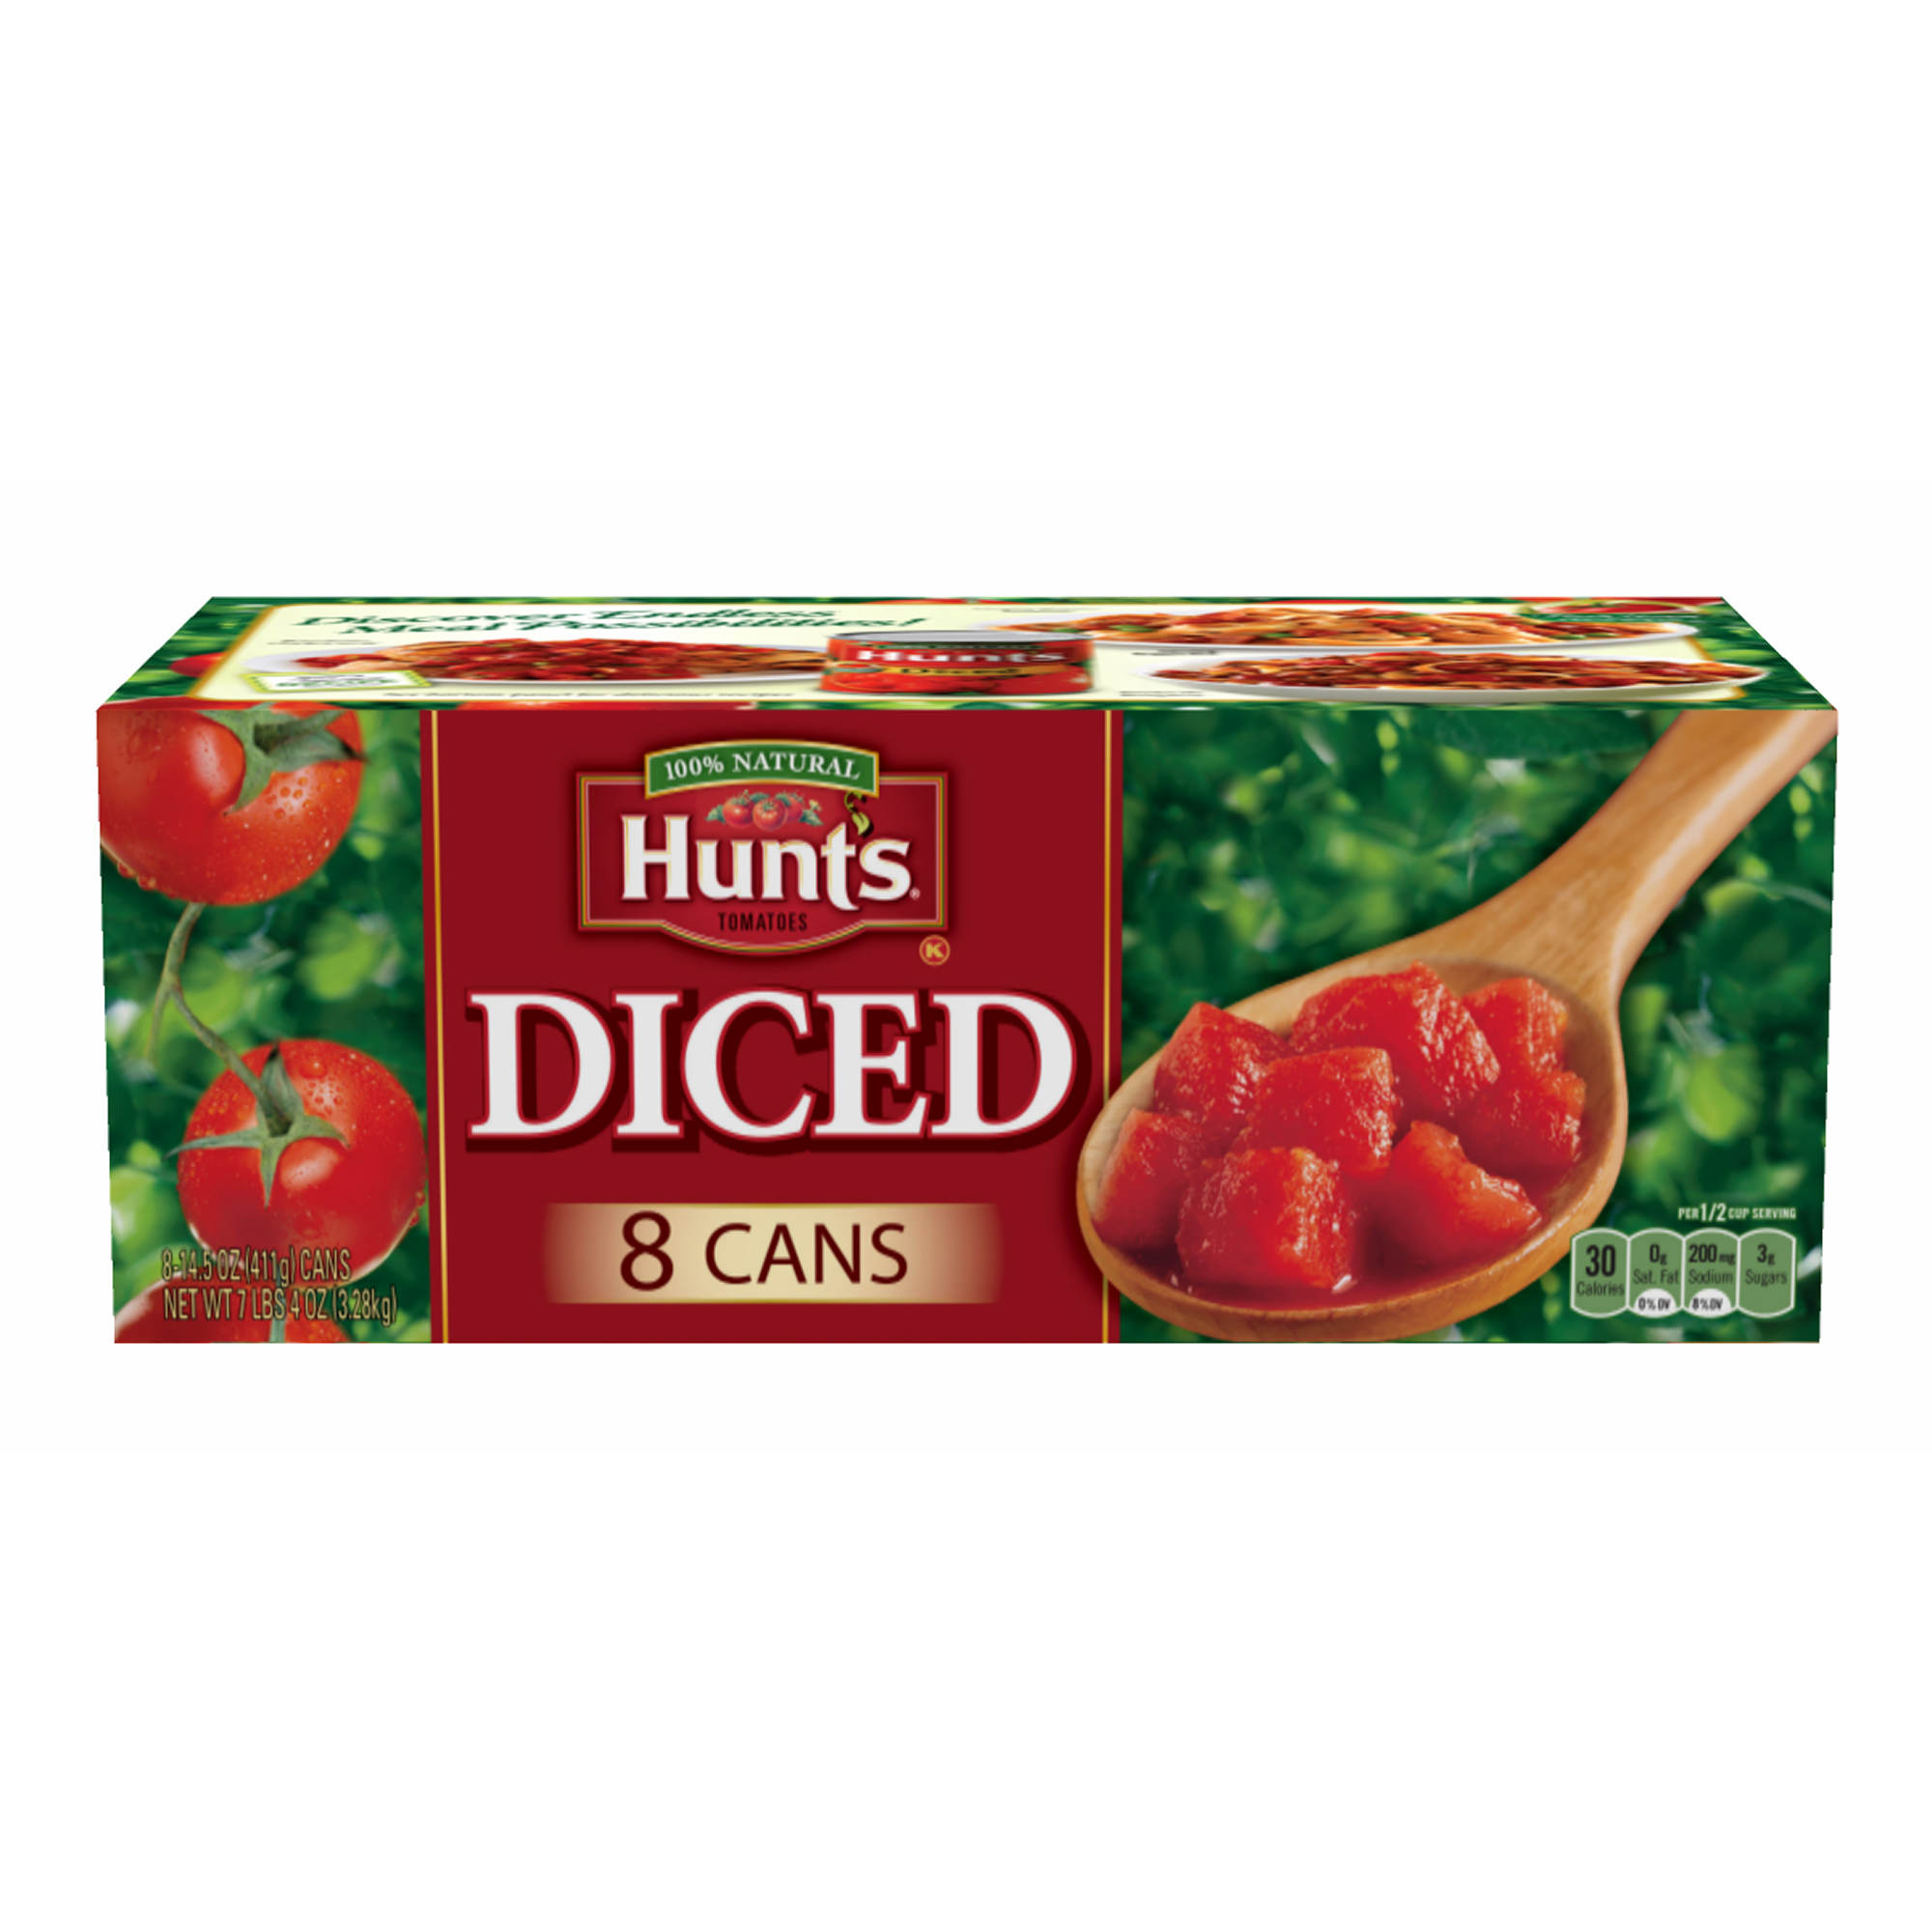 barilla spa case solution pasta sauce tomato products bj s whole  pasta sauce tomato products bj s whole club hunt s diced tomatoes 8 pk 14 5